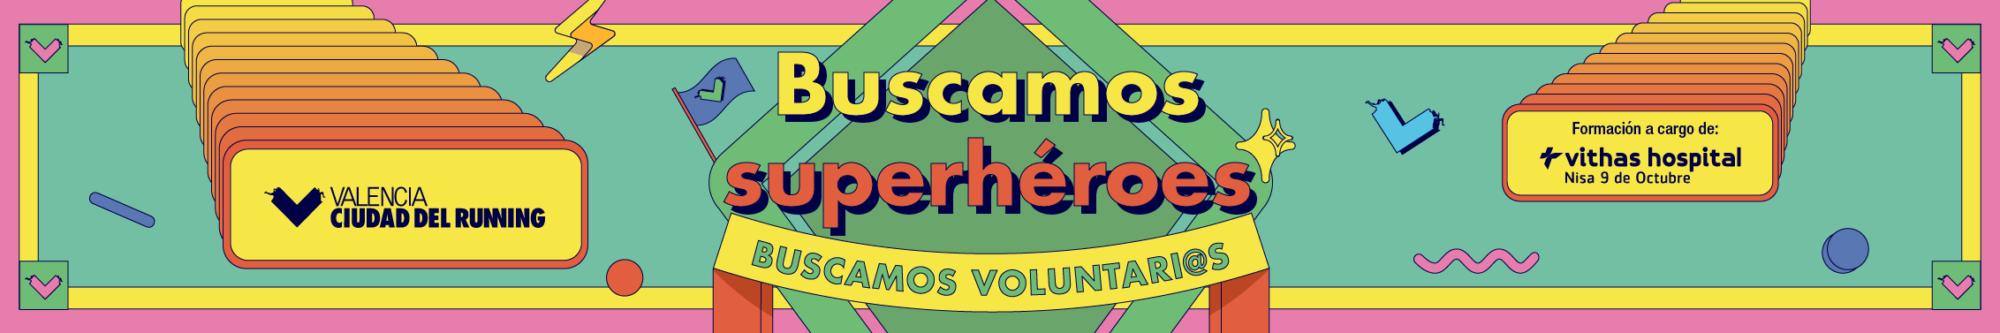 Buscamos superhéroes